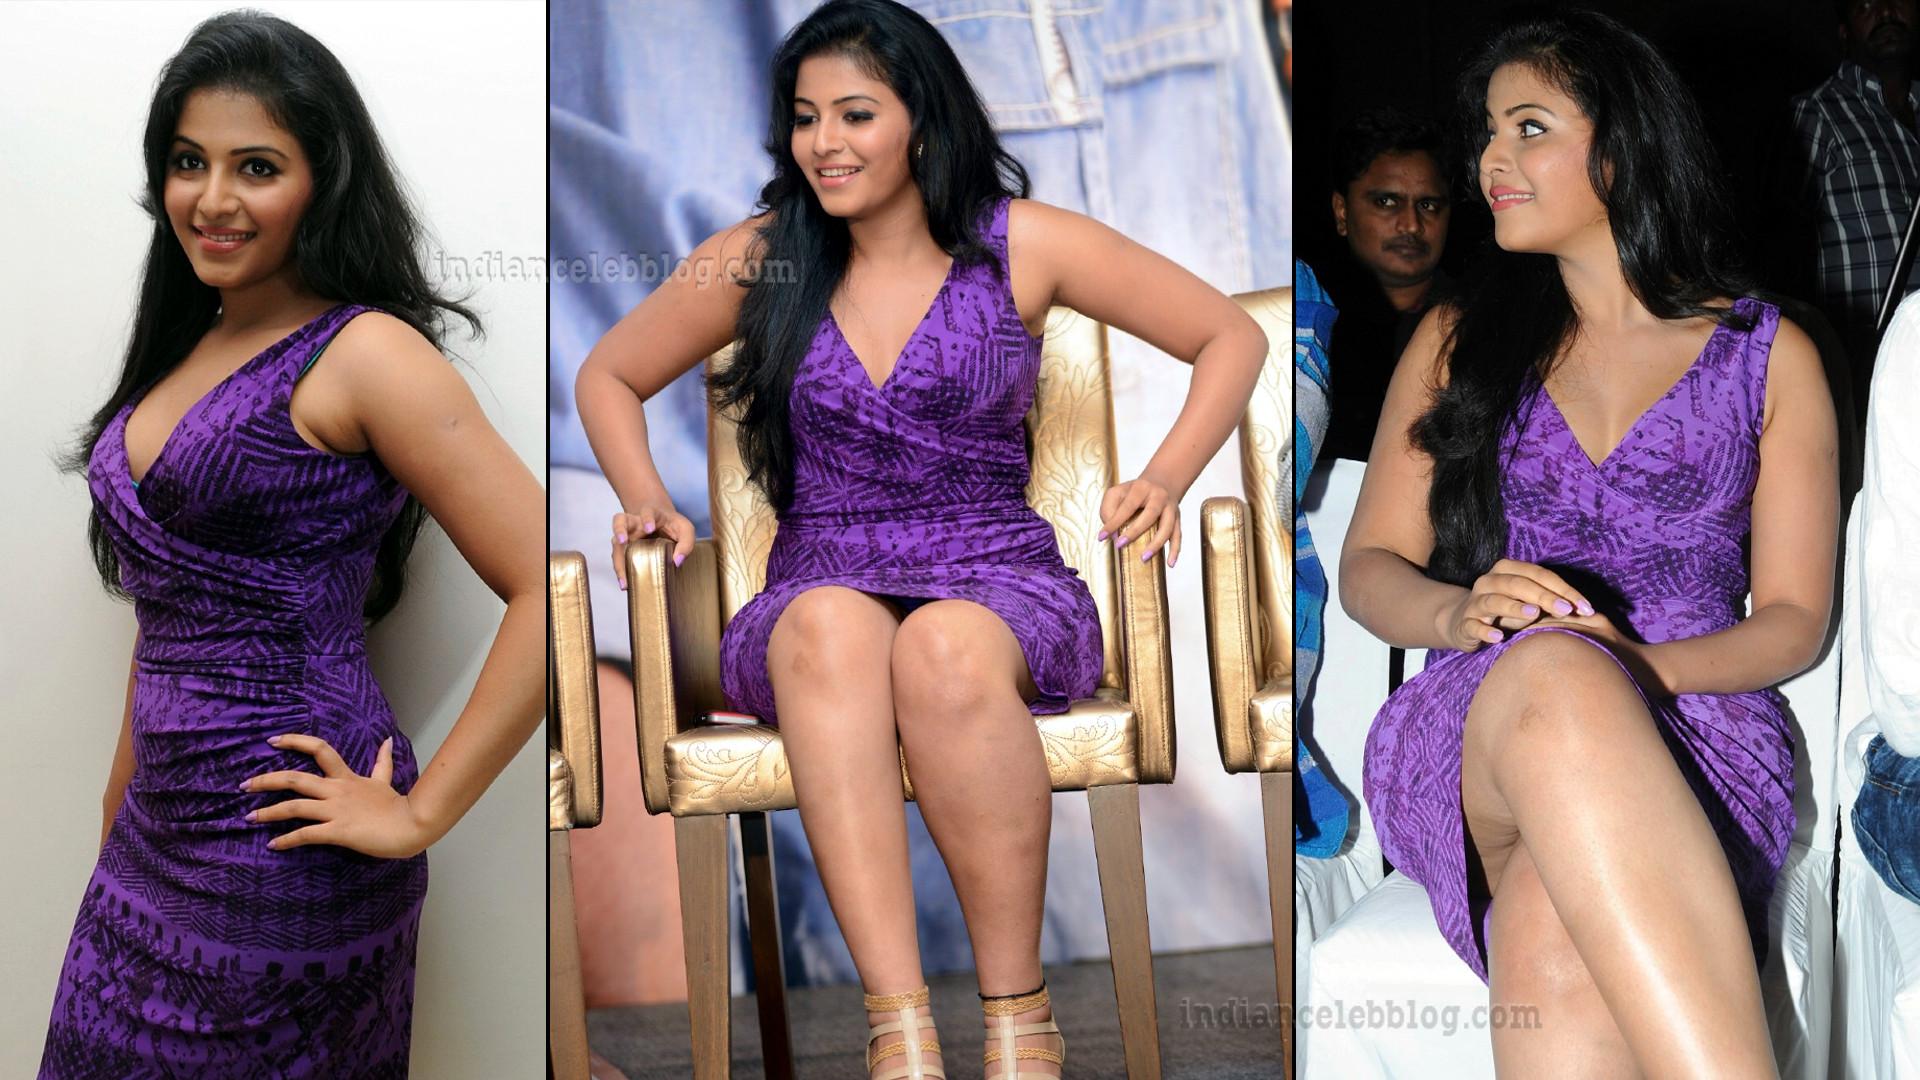 Anjali Tollywood event sexy Mini dress Pics